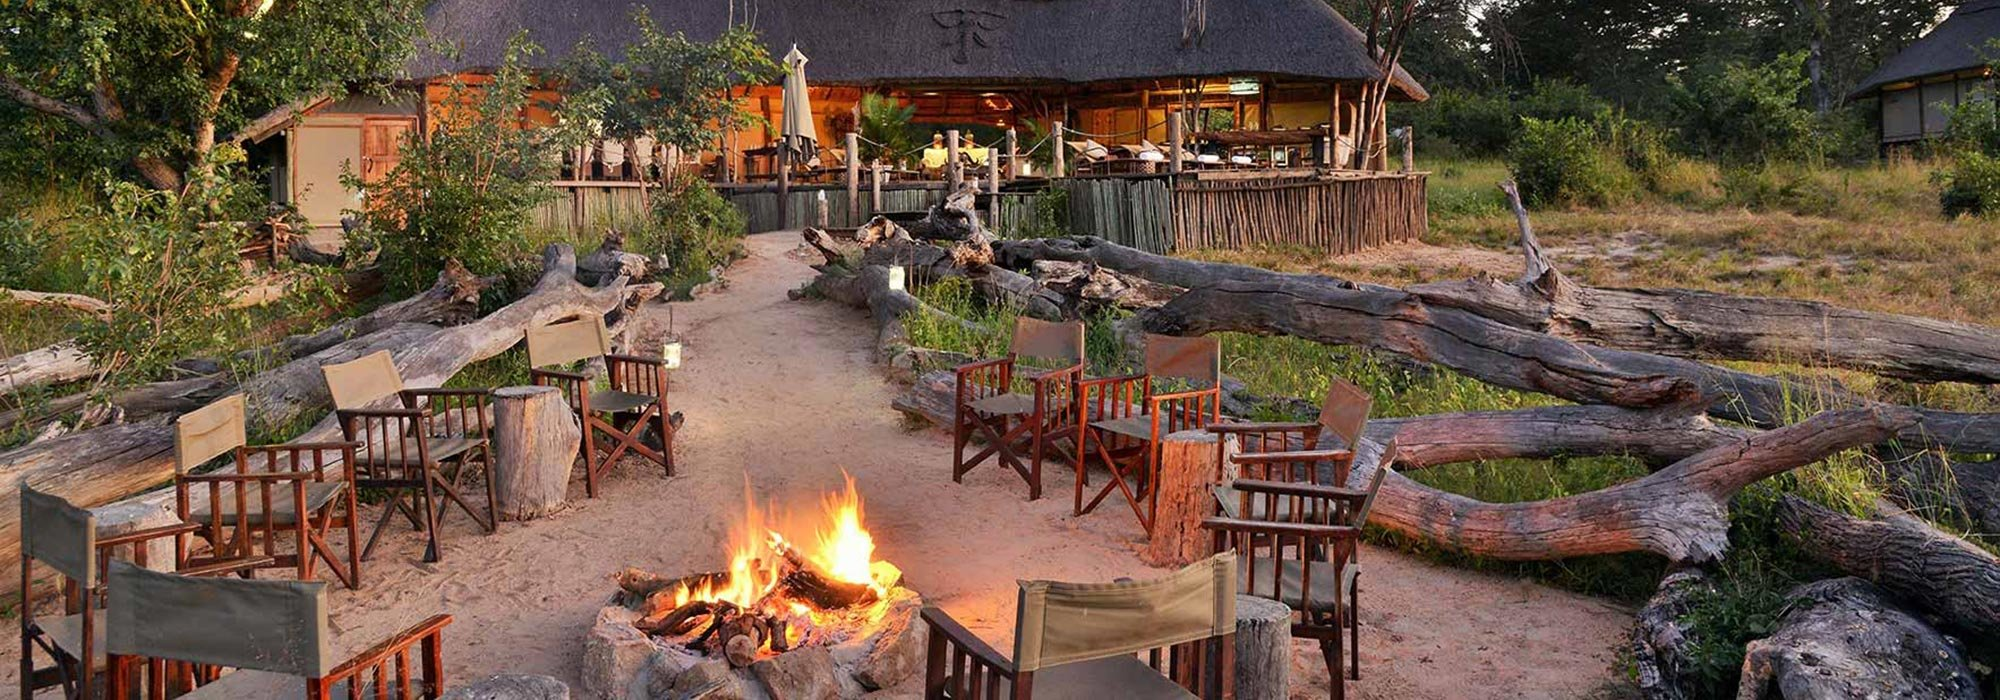 Khulu Camp Boma